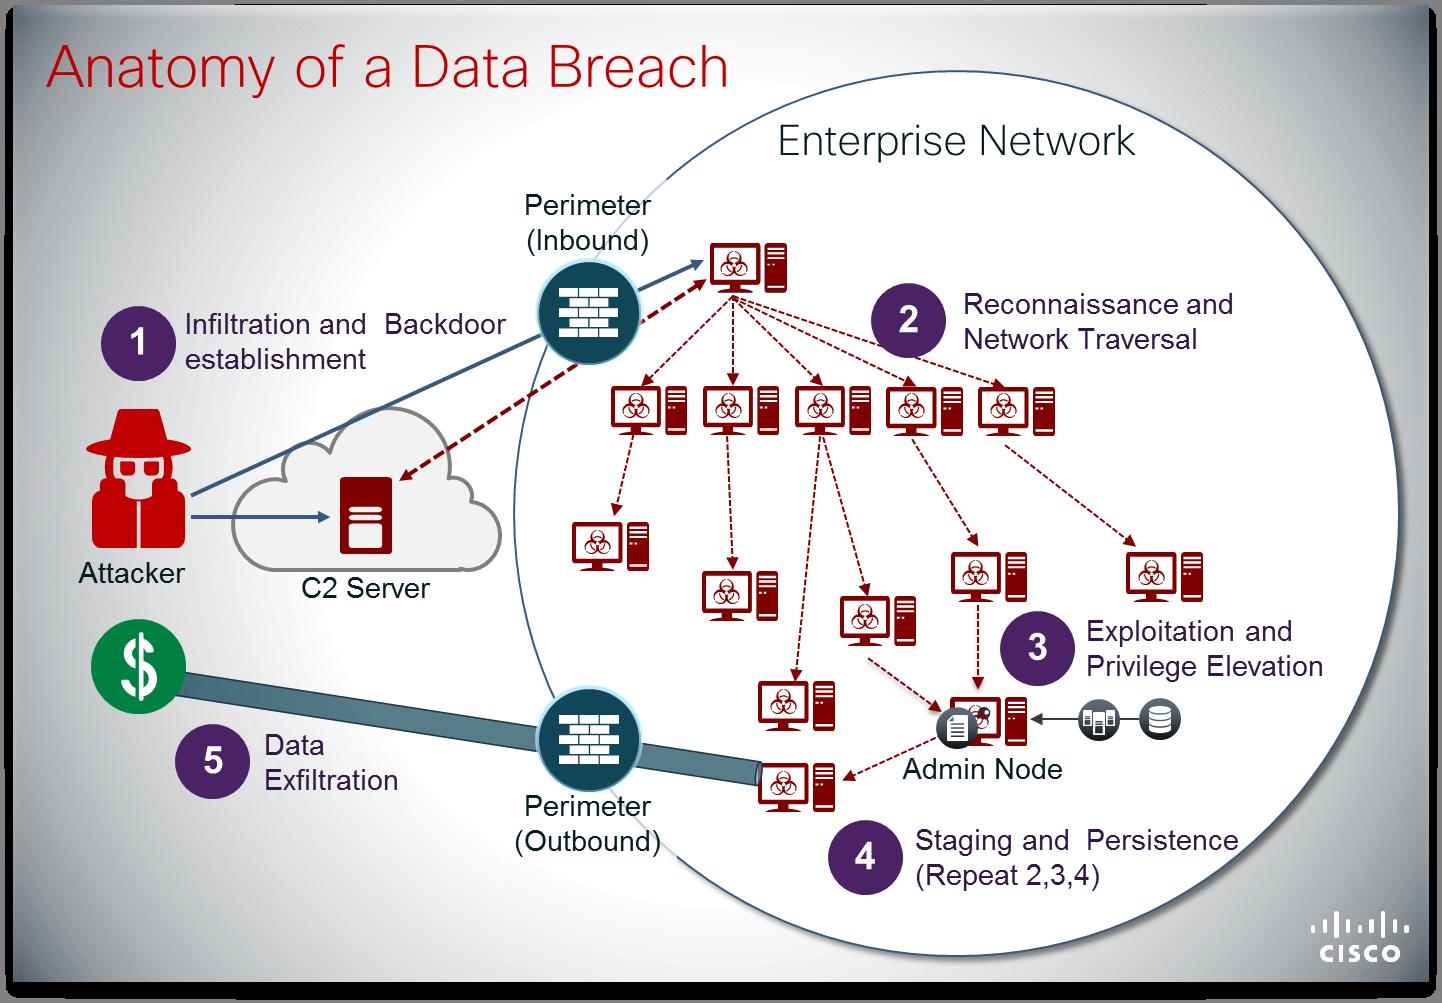 Anatomy of Data Breach